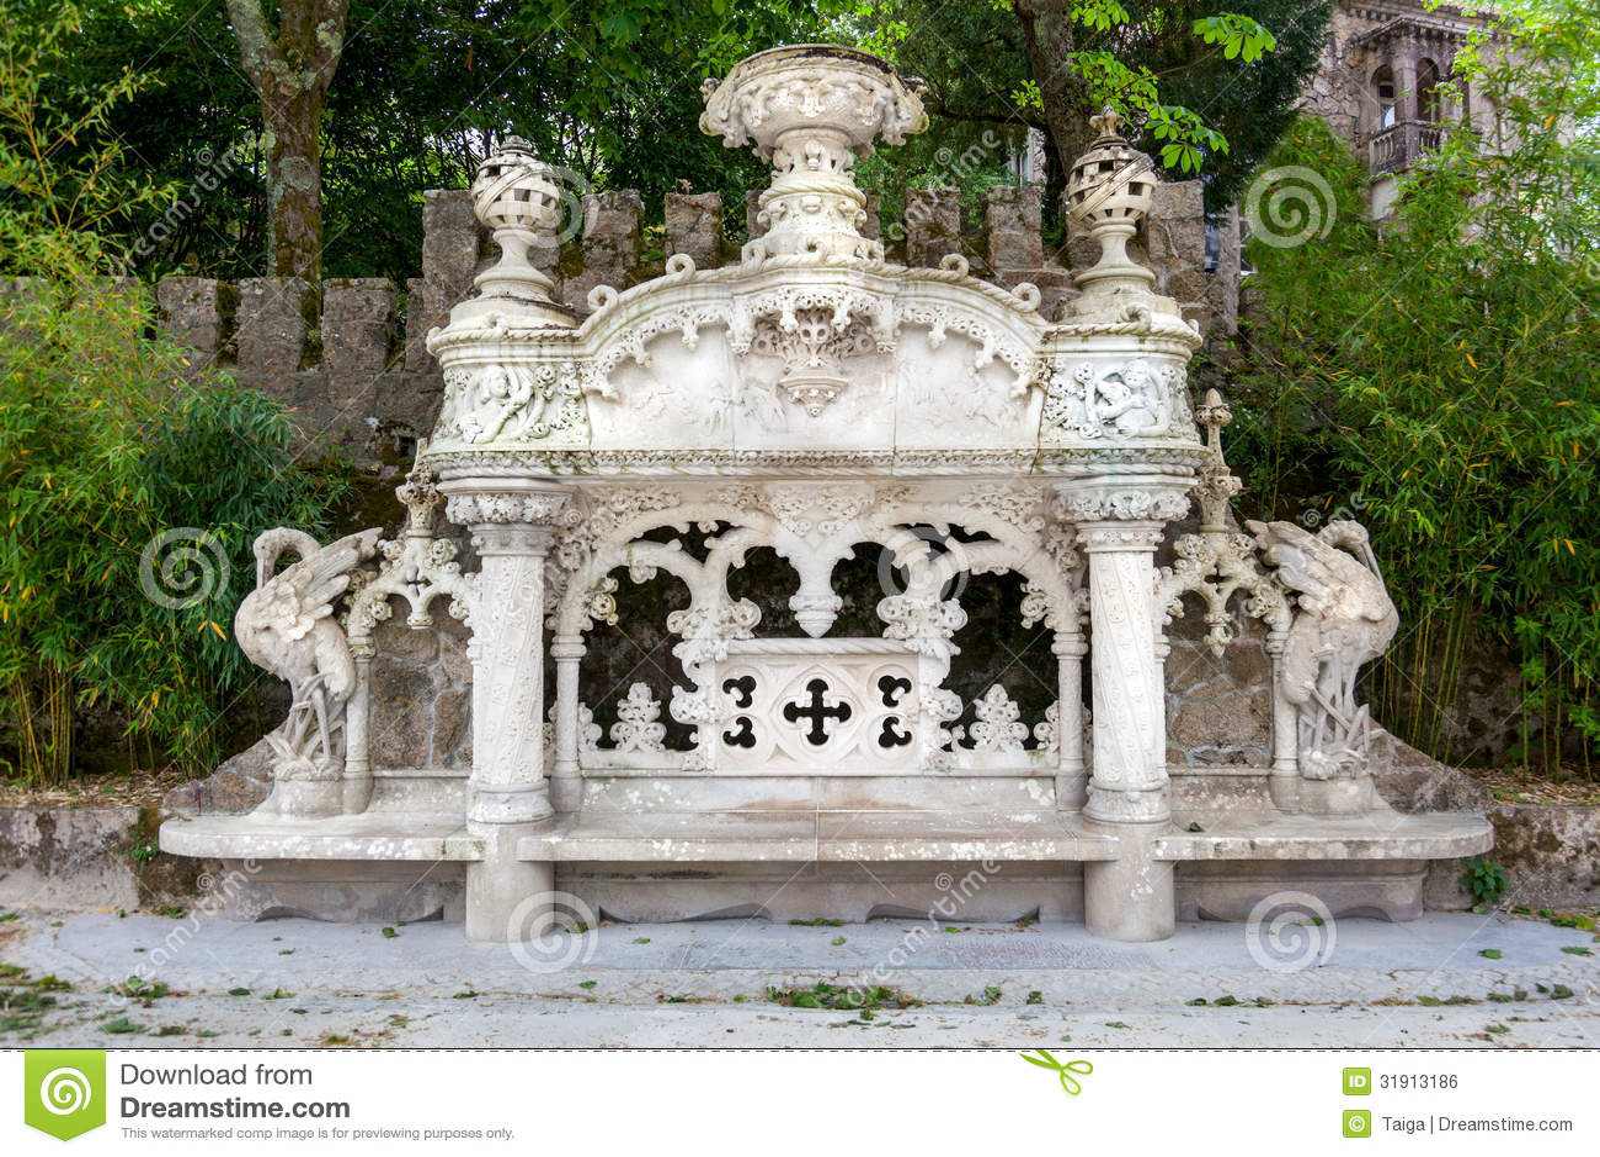 Quinta da regaleira palace in sintra lisbon portugal for Jardines quinta da regaleira